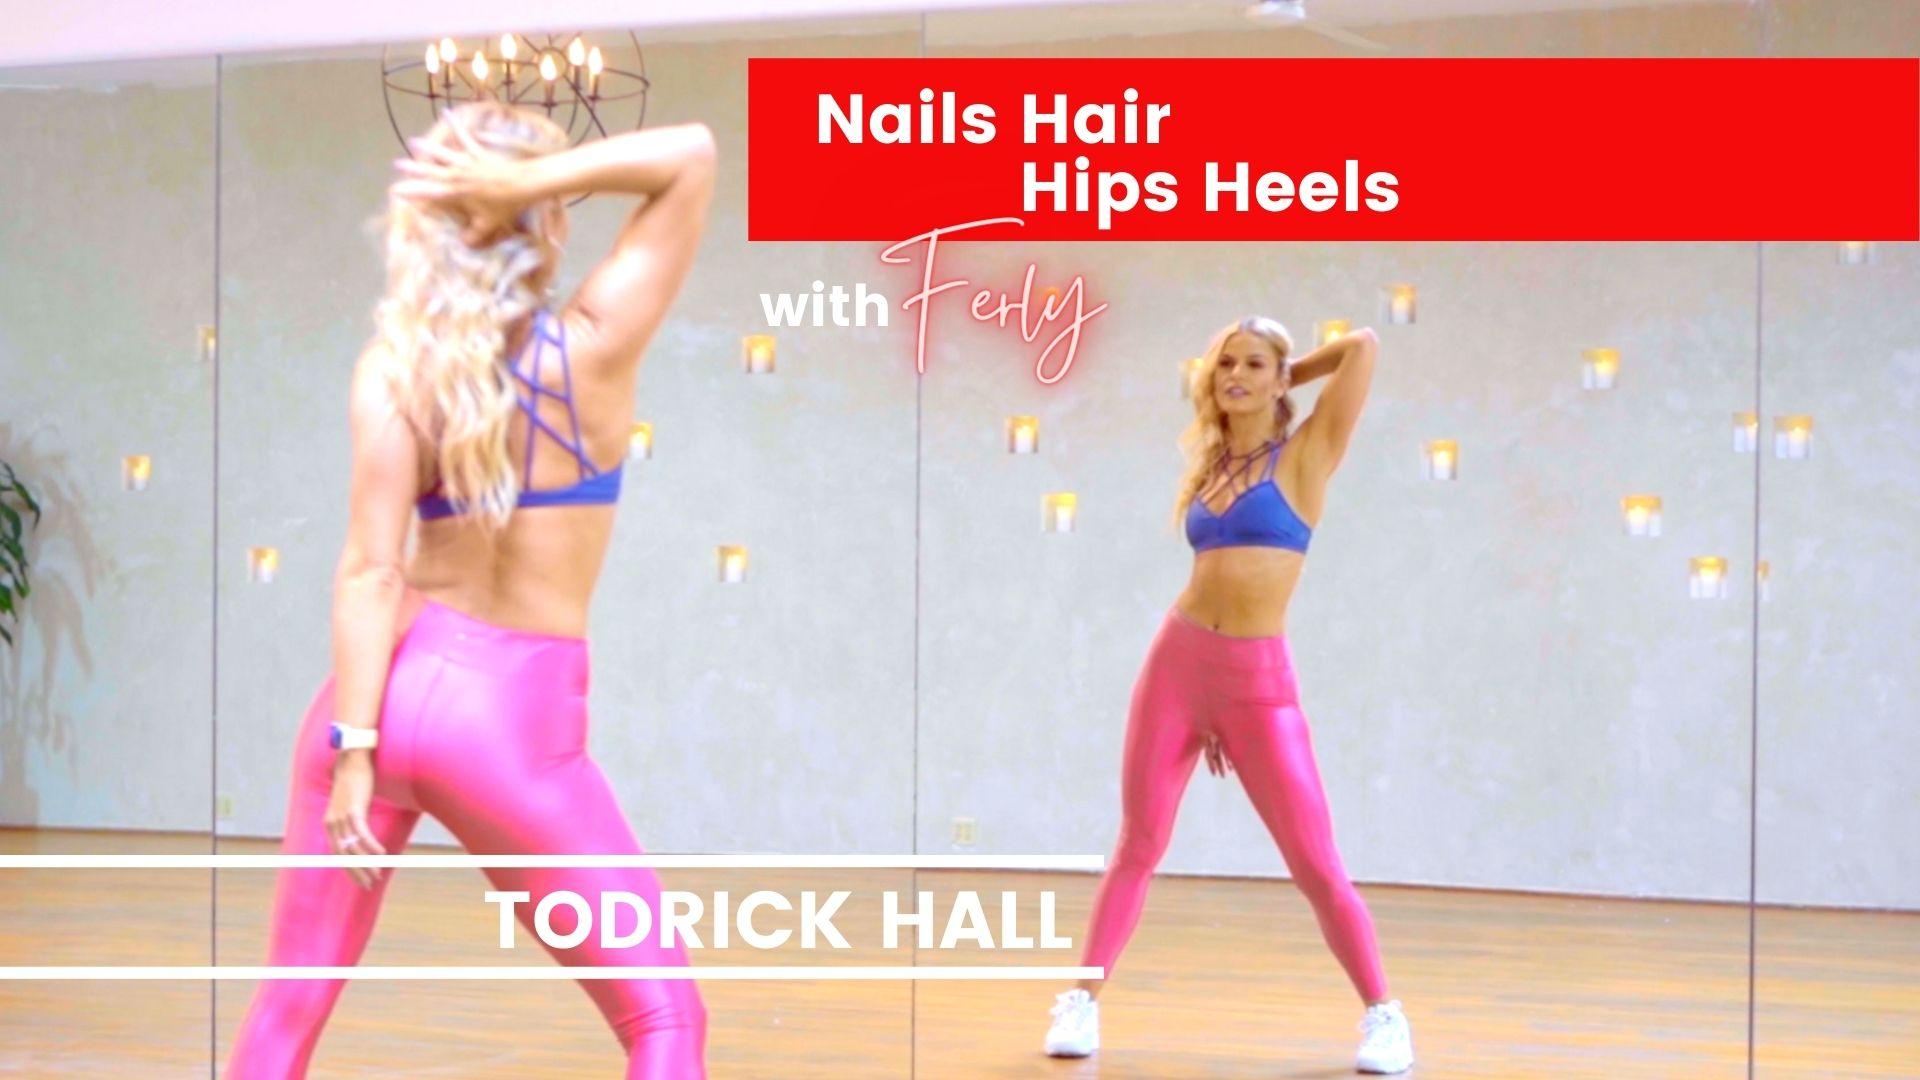 nails hair hips heels todrick hall dance routine tutorial